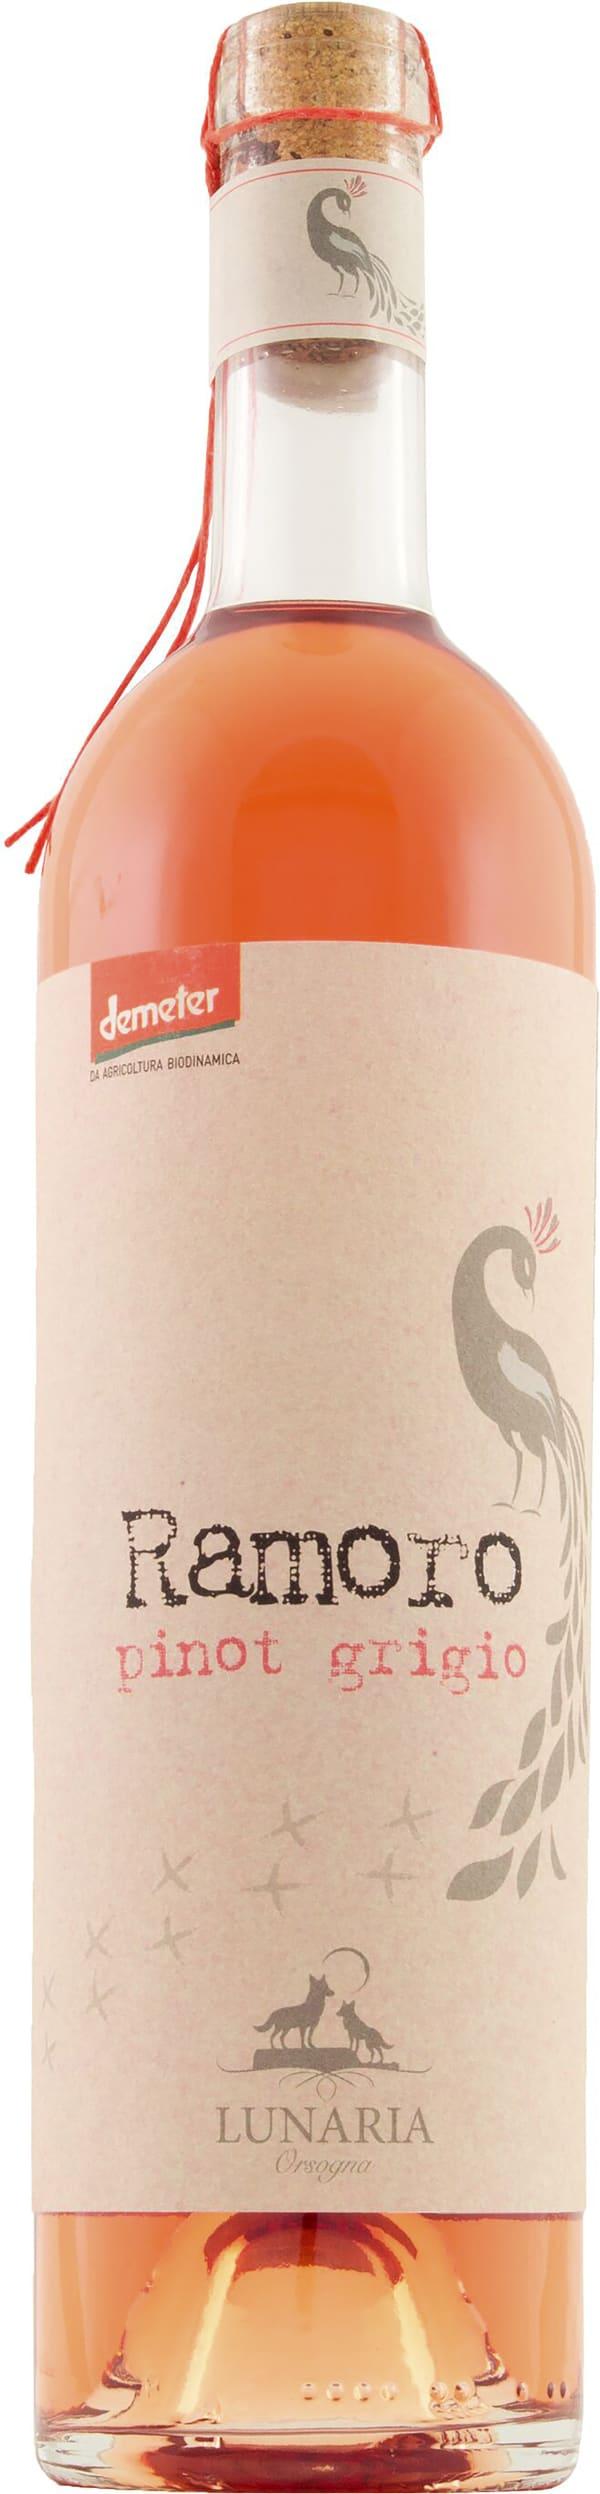 Orsogna Lunaria Ramoro Pinot Grigio Rosé 2019